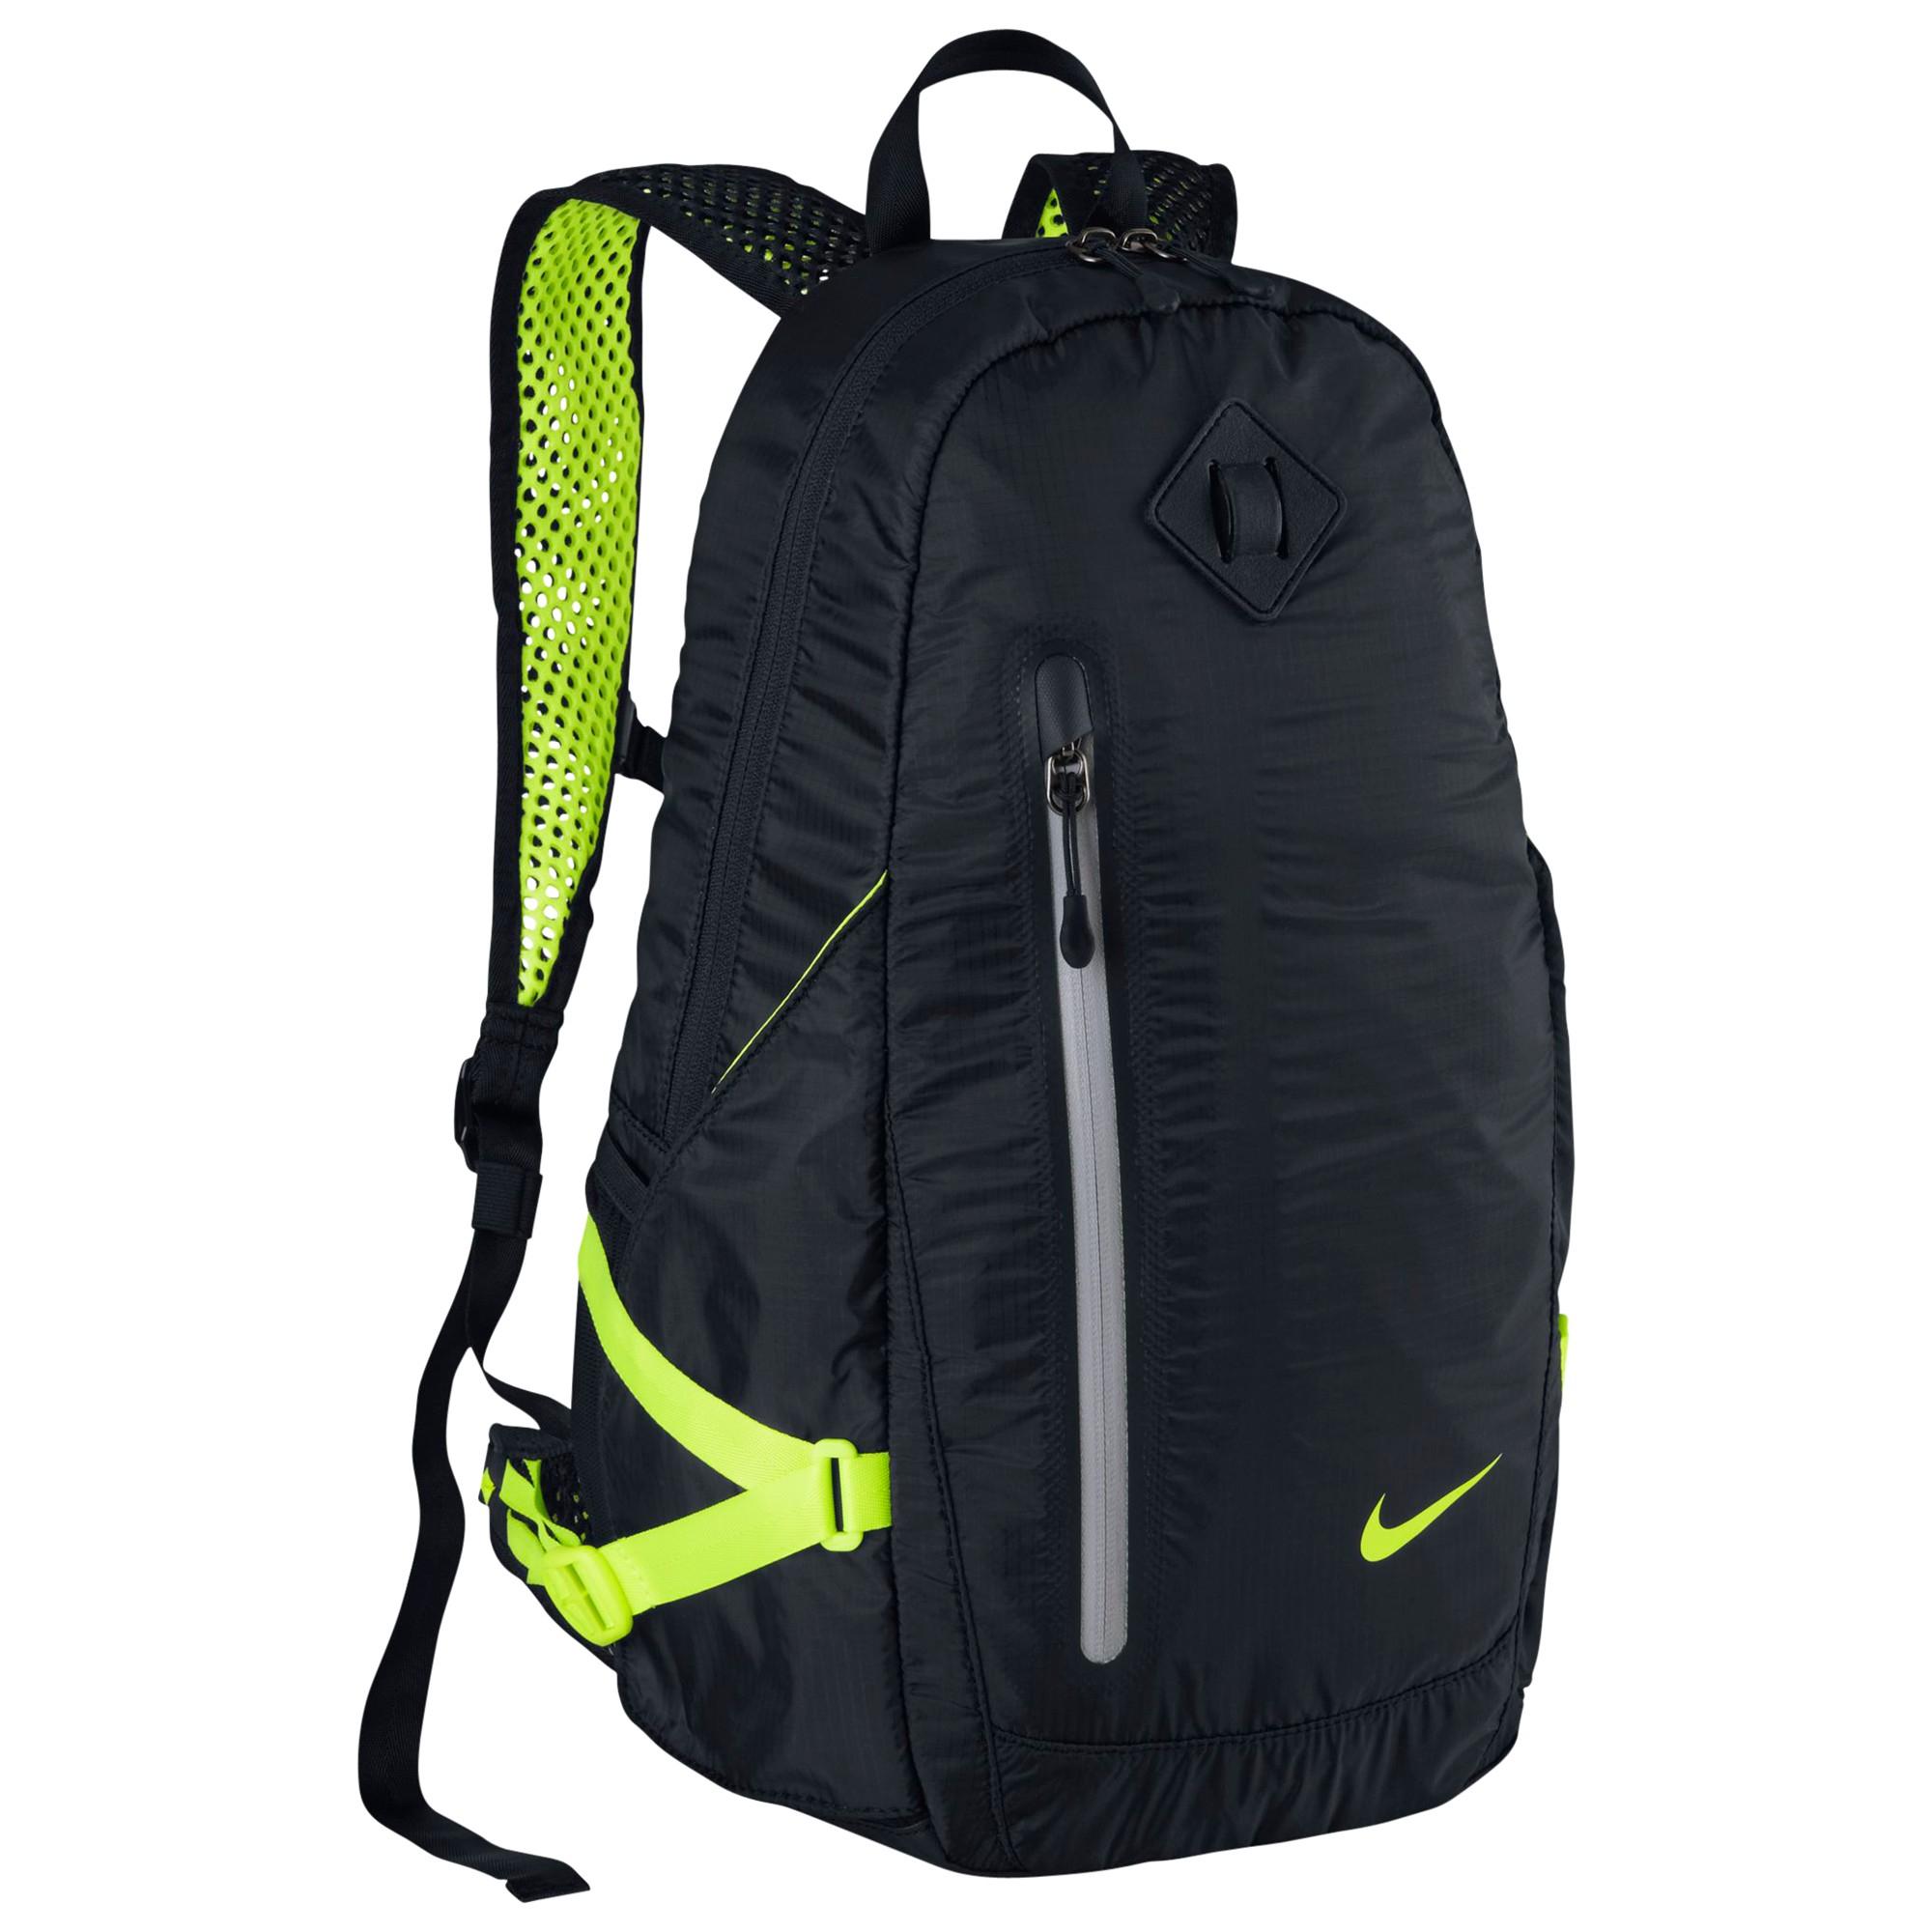 e1aeedaf0eb3 Nike Vapor Lite Running Backpack in Black - Lyst